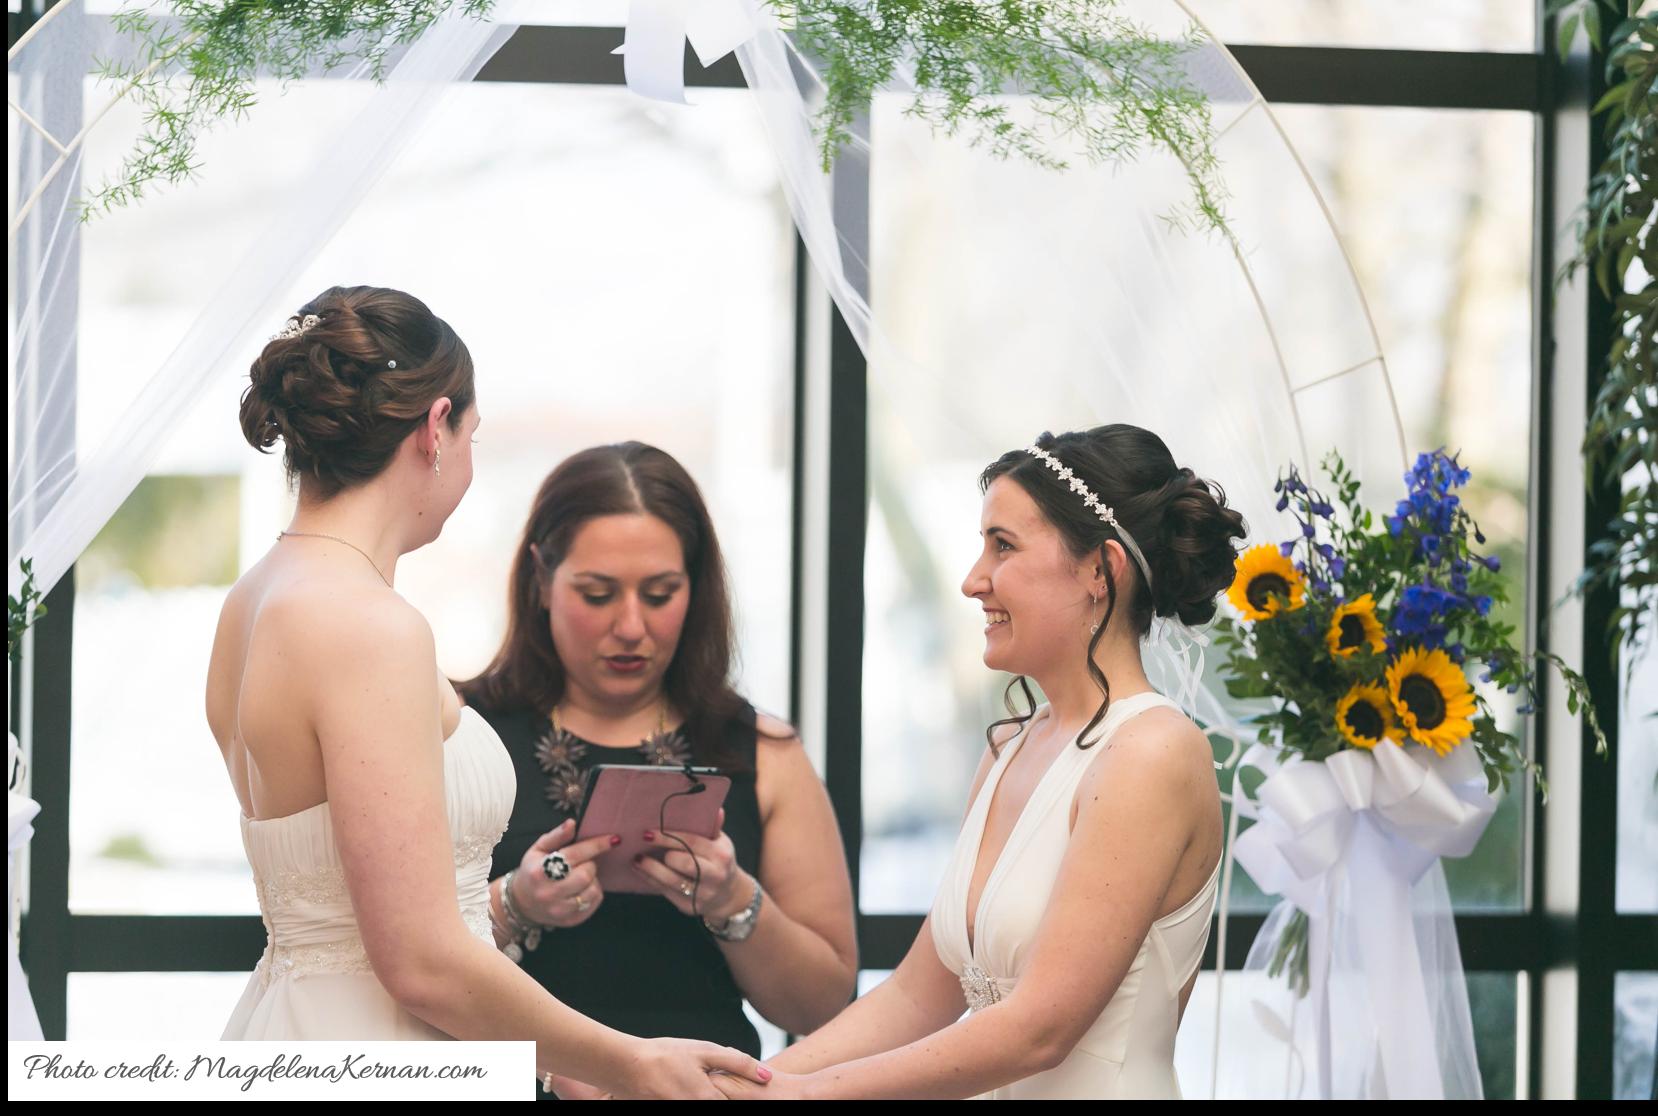 Chelsea _ Tina wedding 3.png